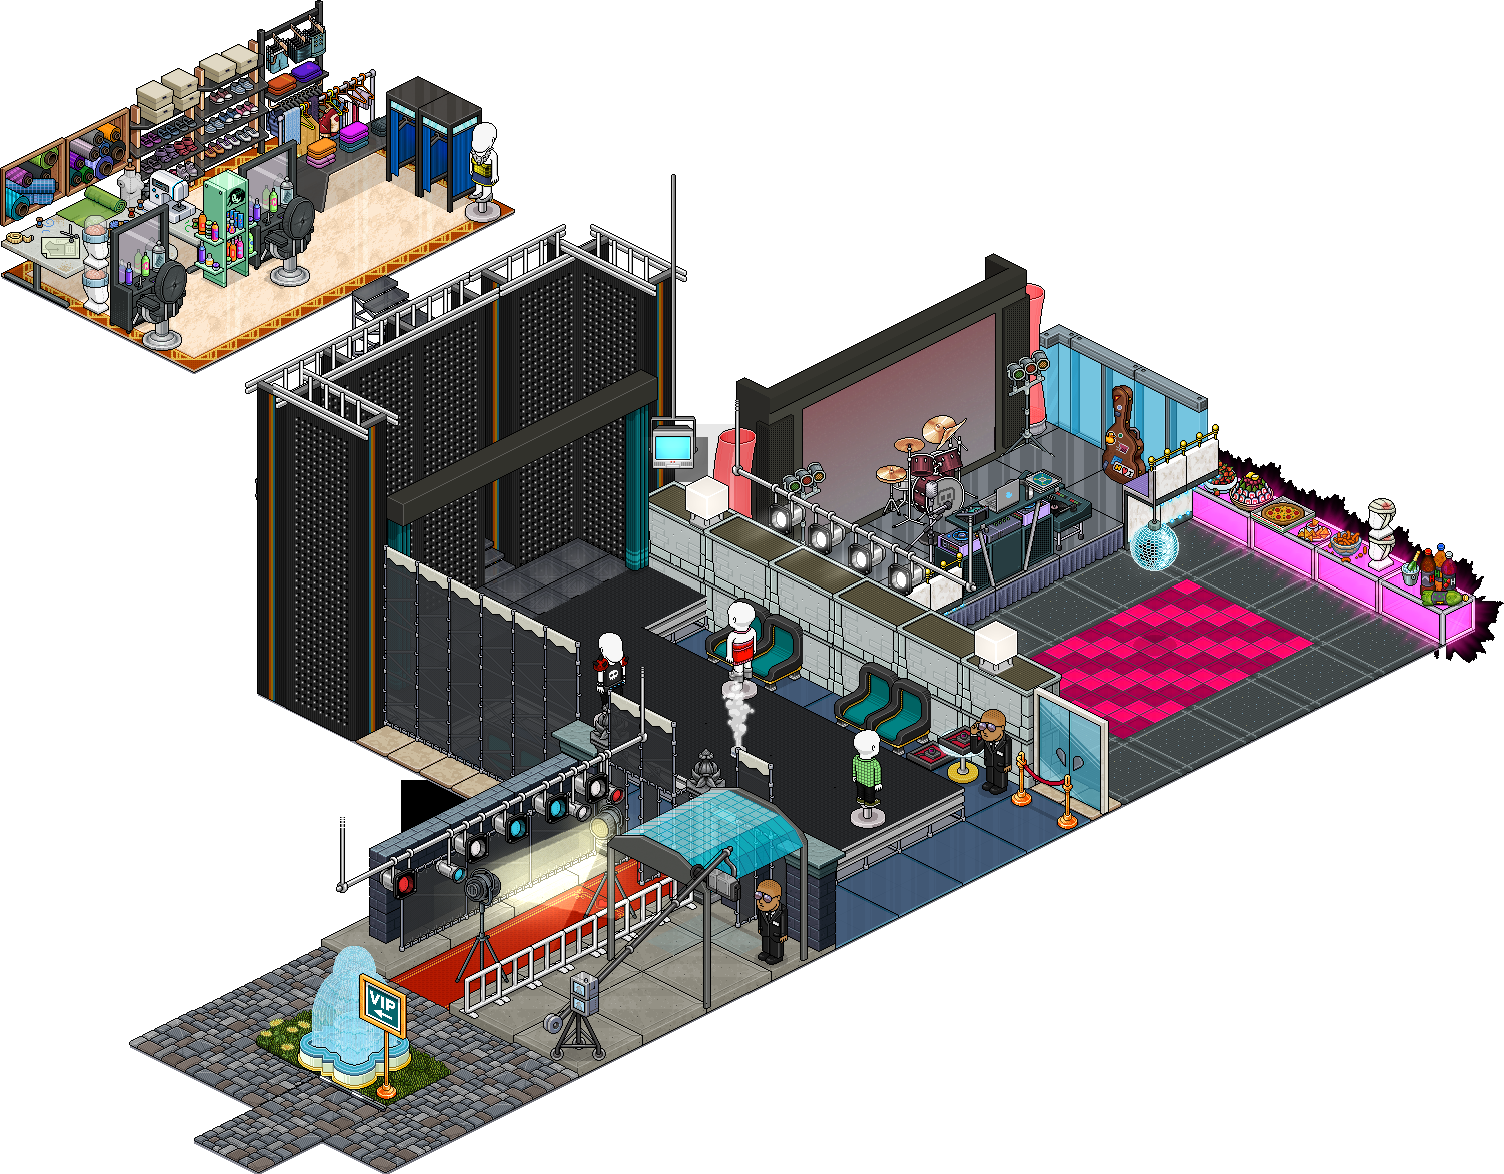 Reinseriti 4 affari stanza Passerella Fashion Week su Habbo Ktinm910